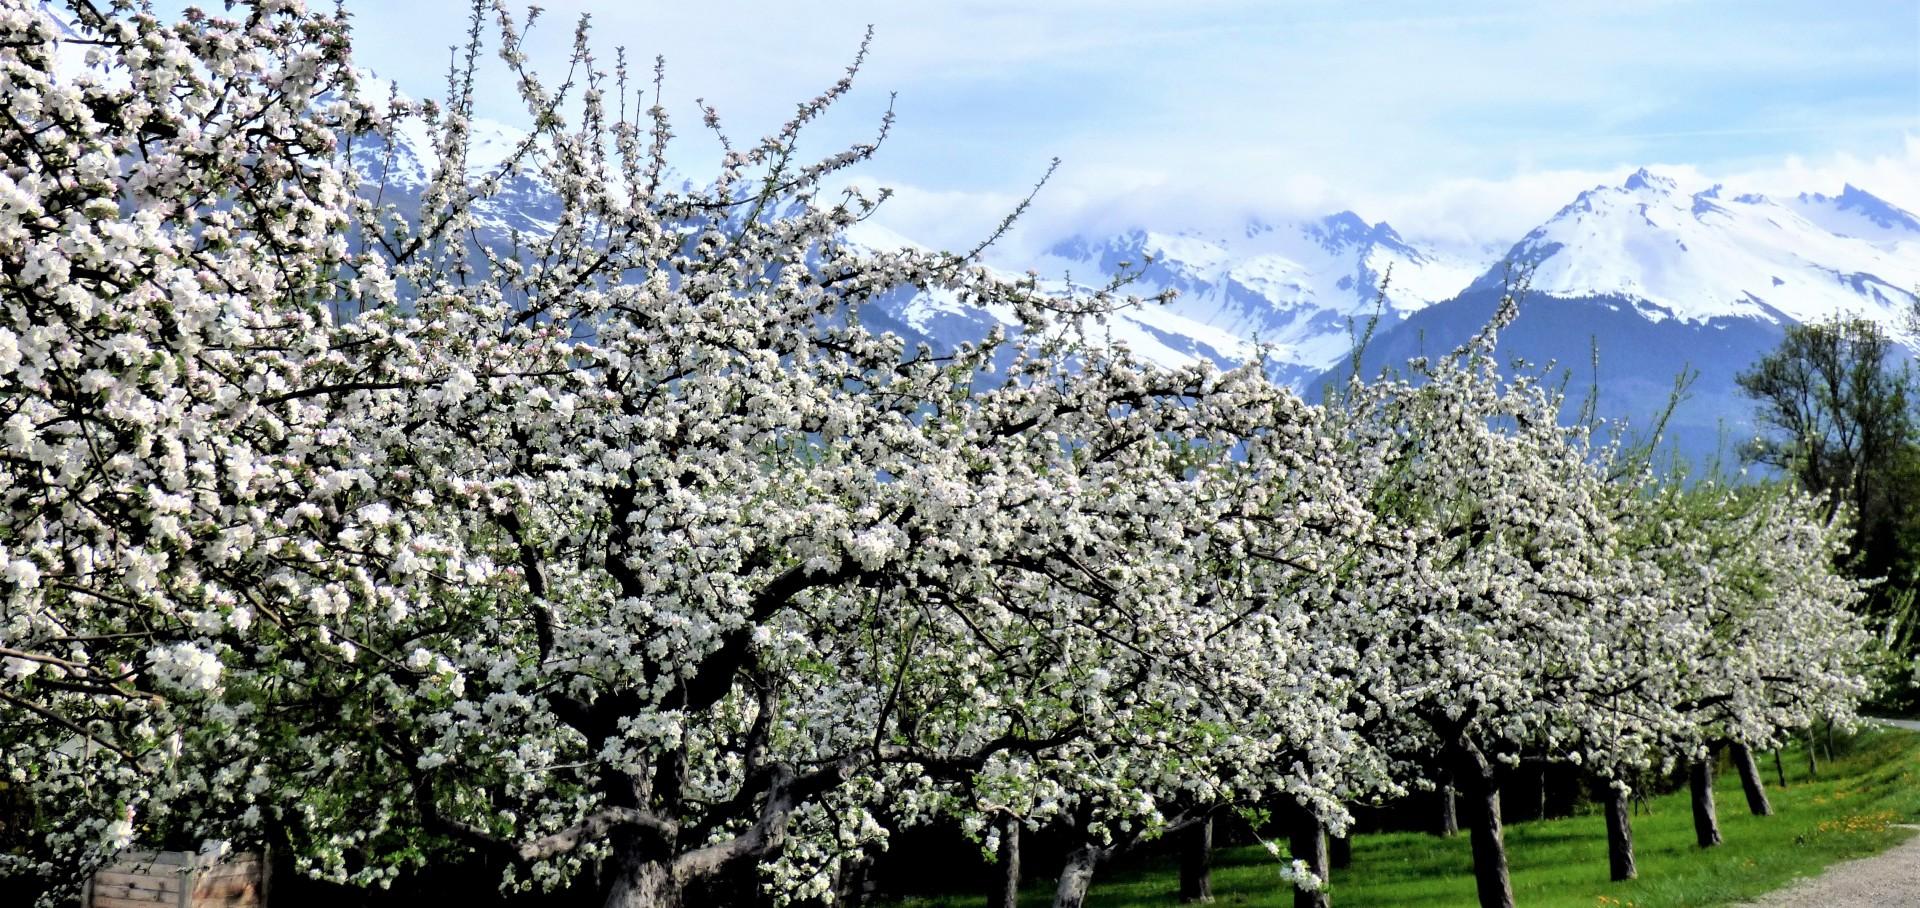 landry-pommiers-fleuris-avril-54056